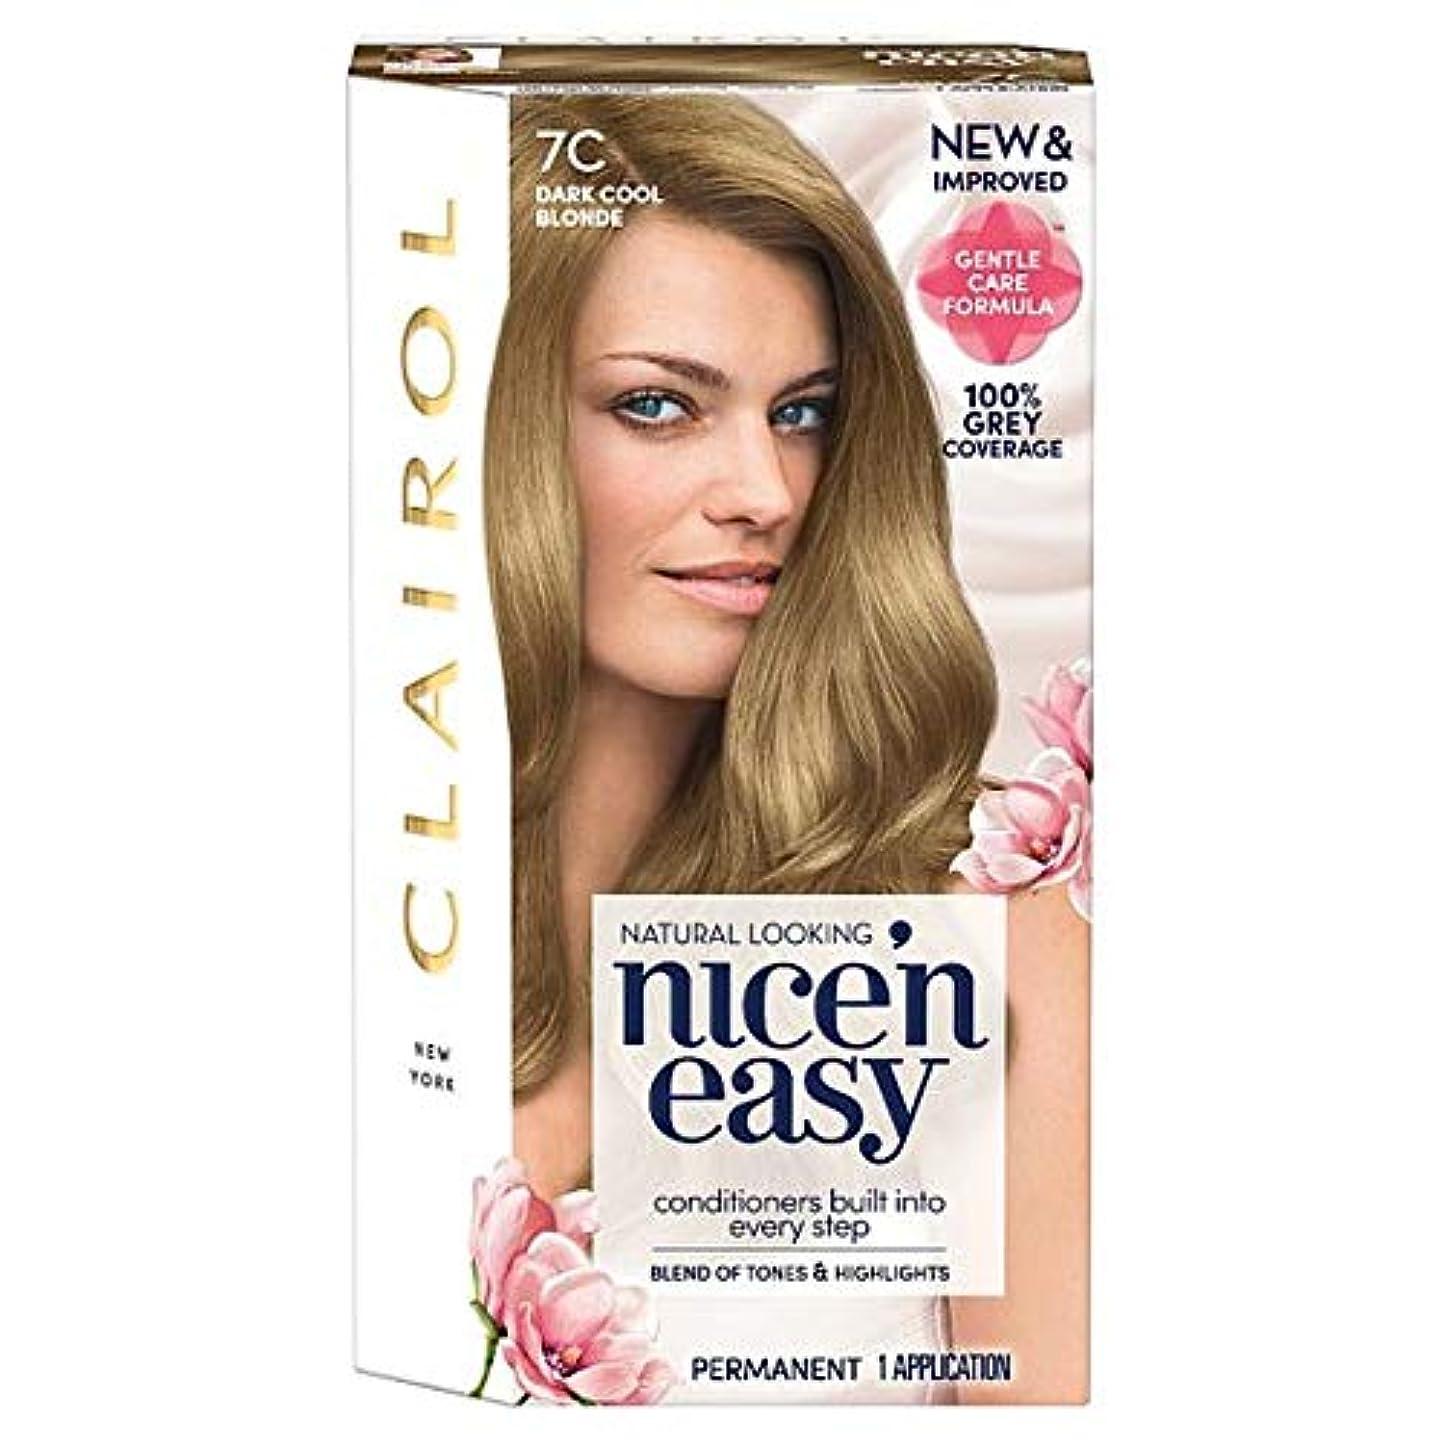 [Nice'n Easy] クレイロール素敵な「N簡単ダーククールなブロンド7Cの染毛剤 - Clairol Nice 'N Easy Dark Cool Blonde 7C Hair Dye [並行輸入品]